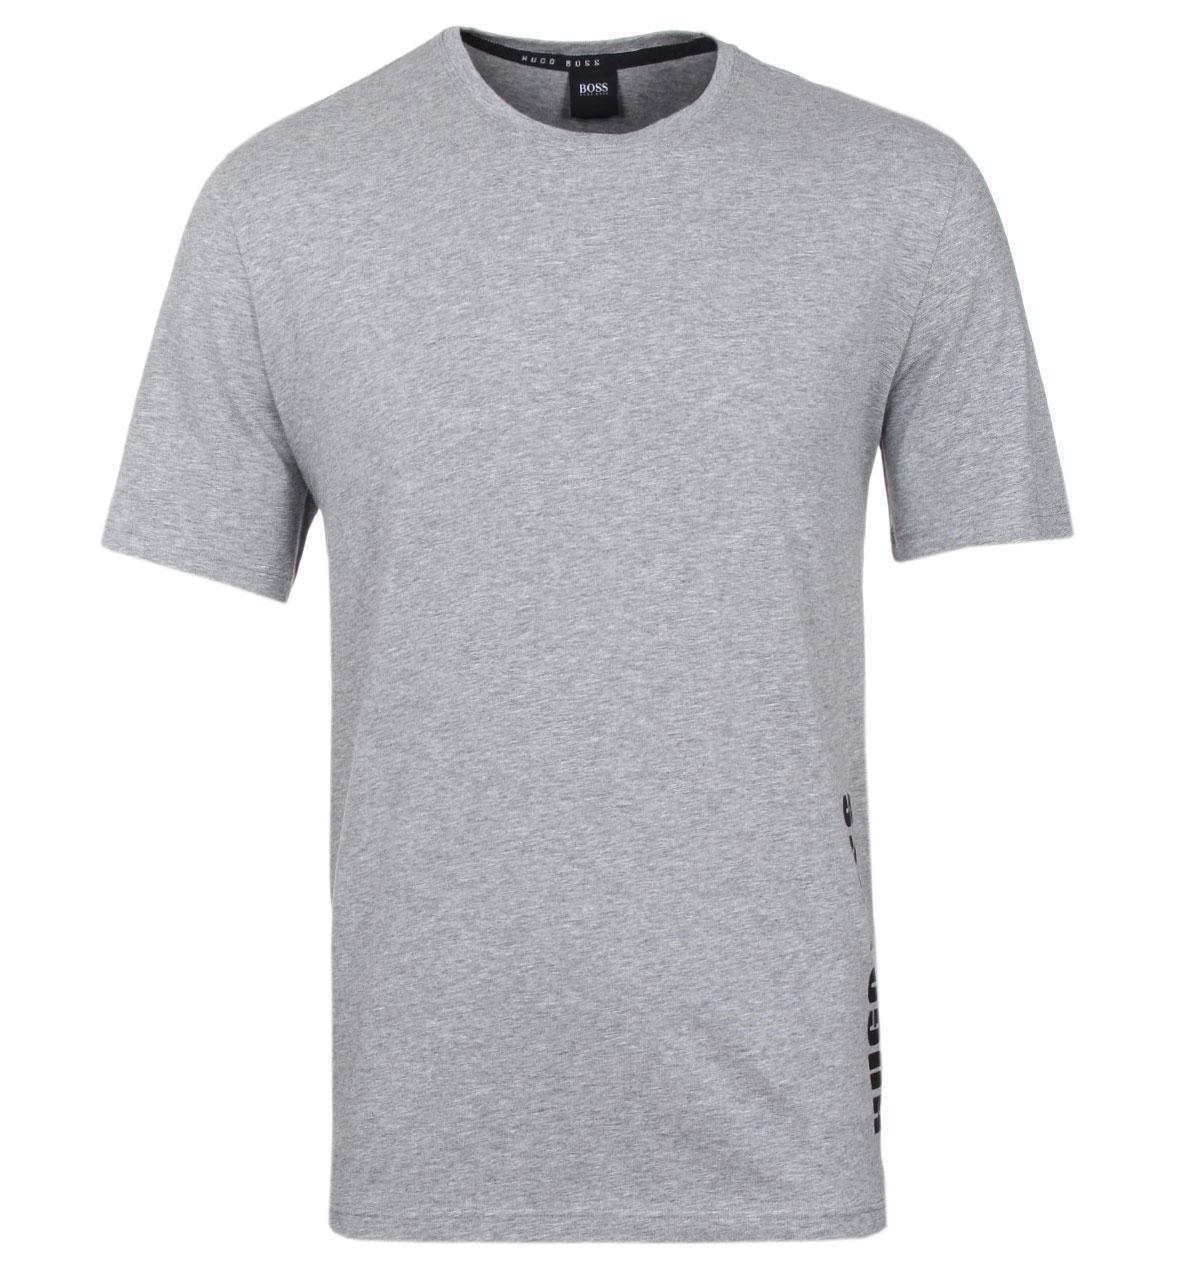 Lyst Boss By Hugo Boss Grey Identity T Shirt In Gray For Men